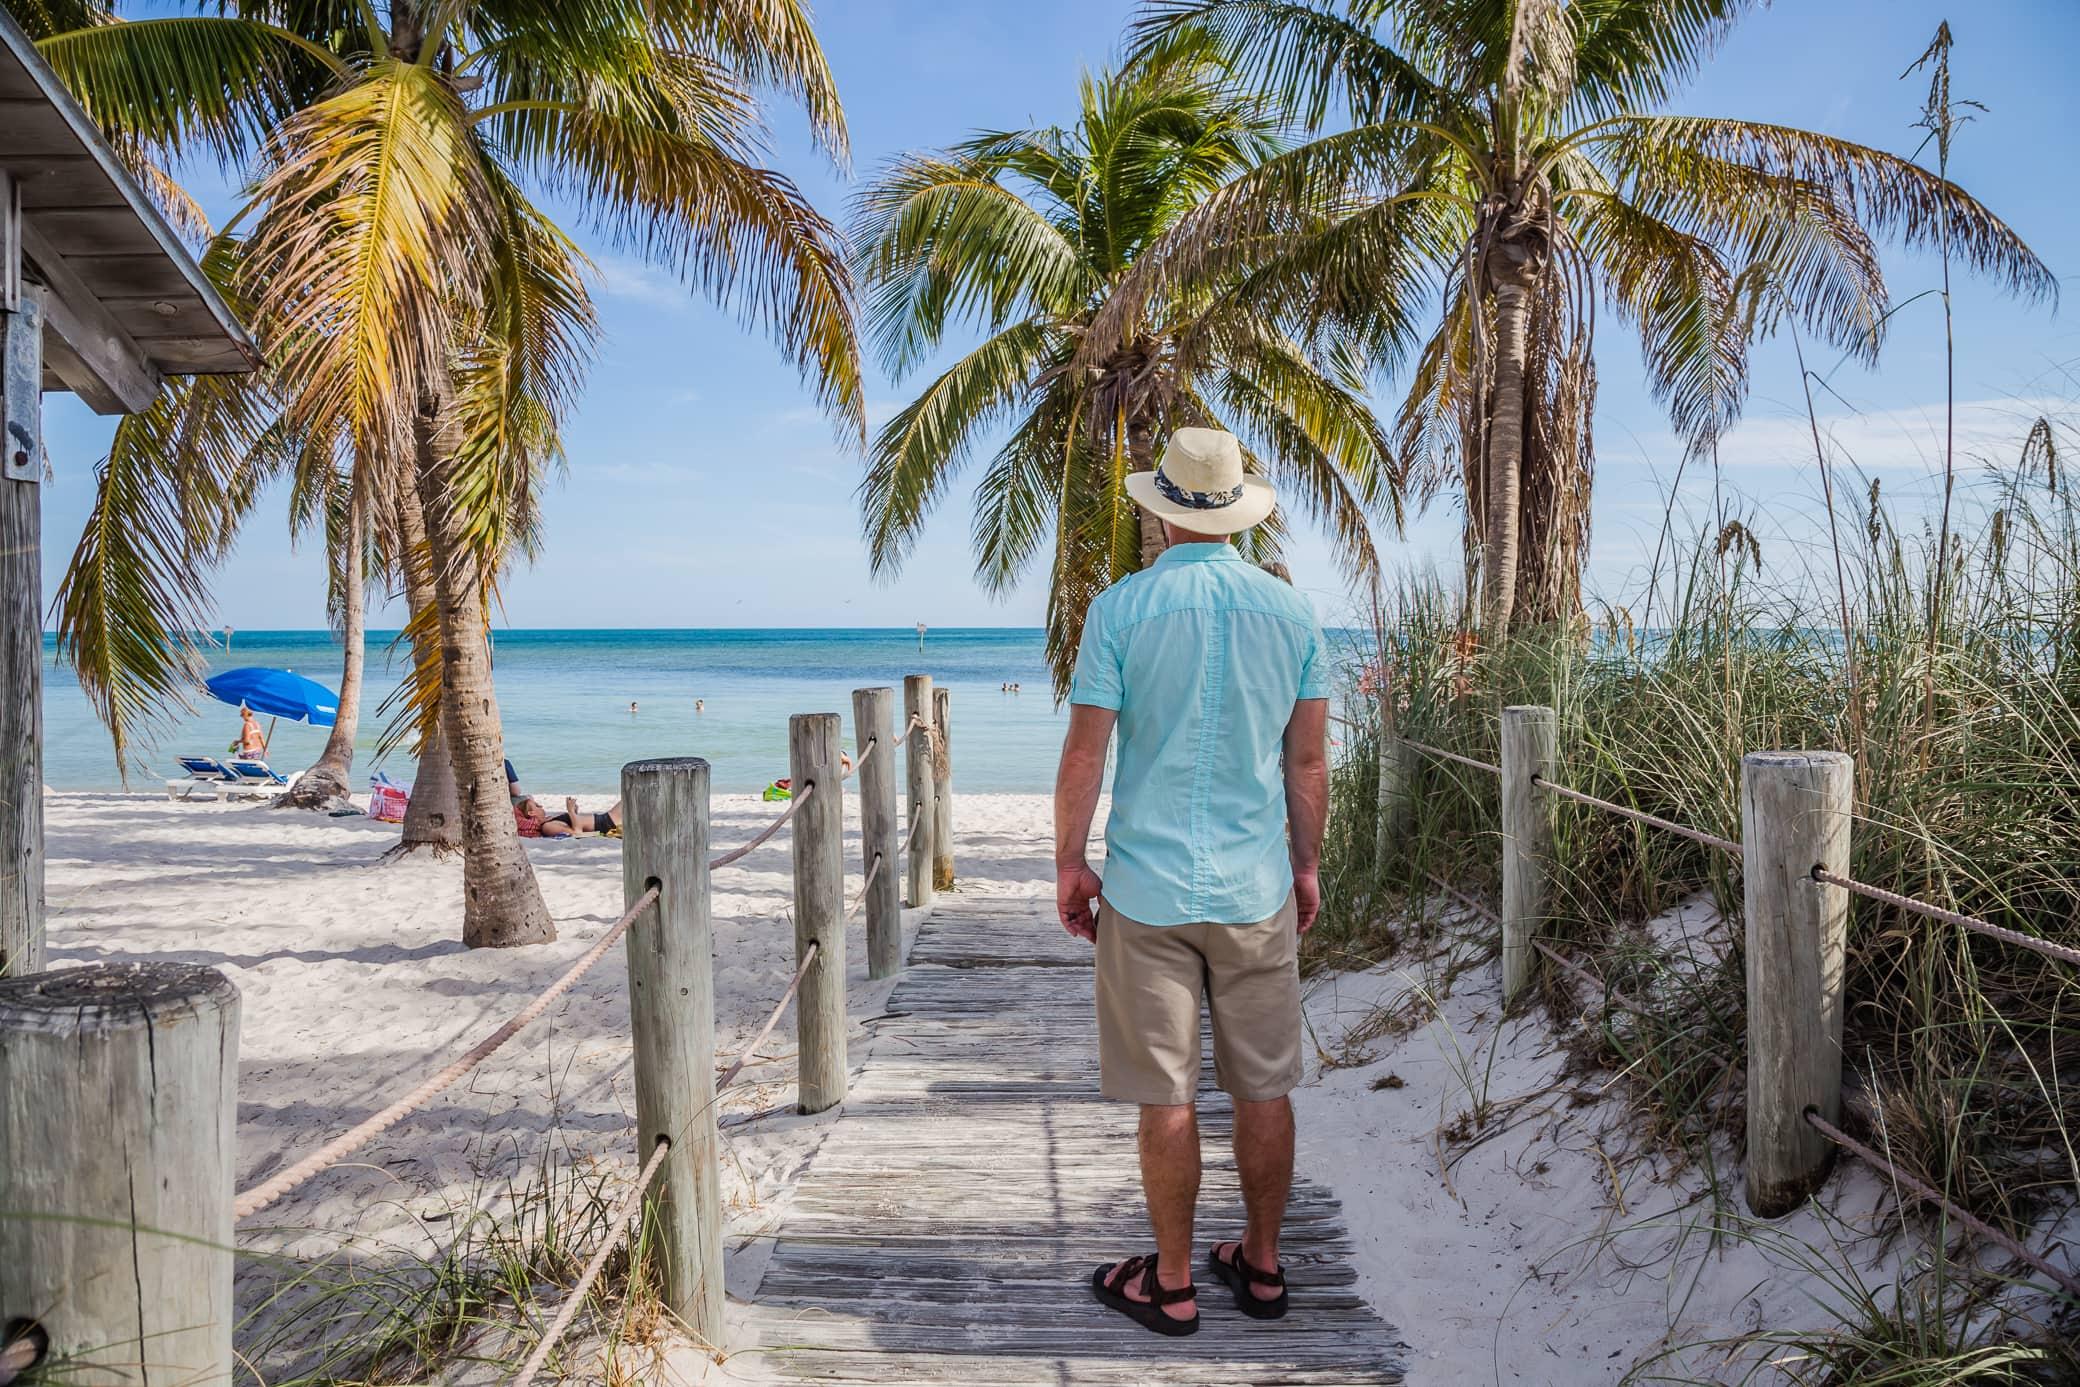 David Stock at Smathers Beach in Key West, Florida Keys